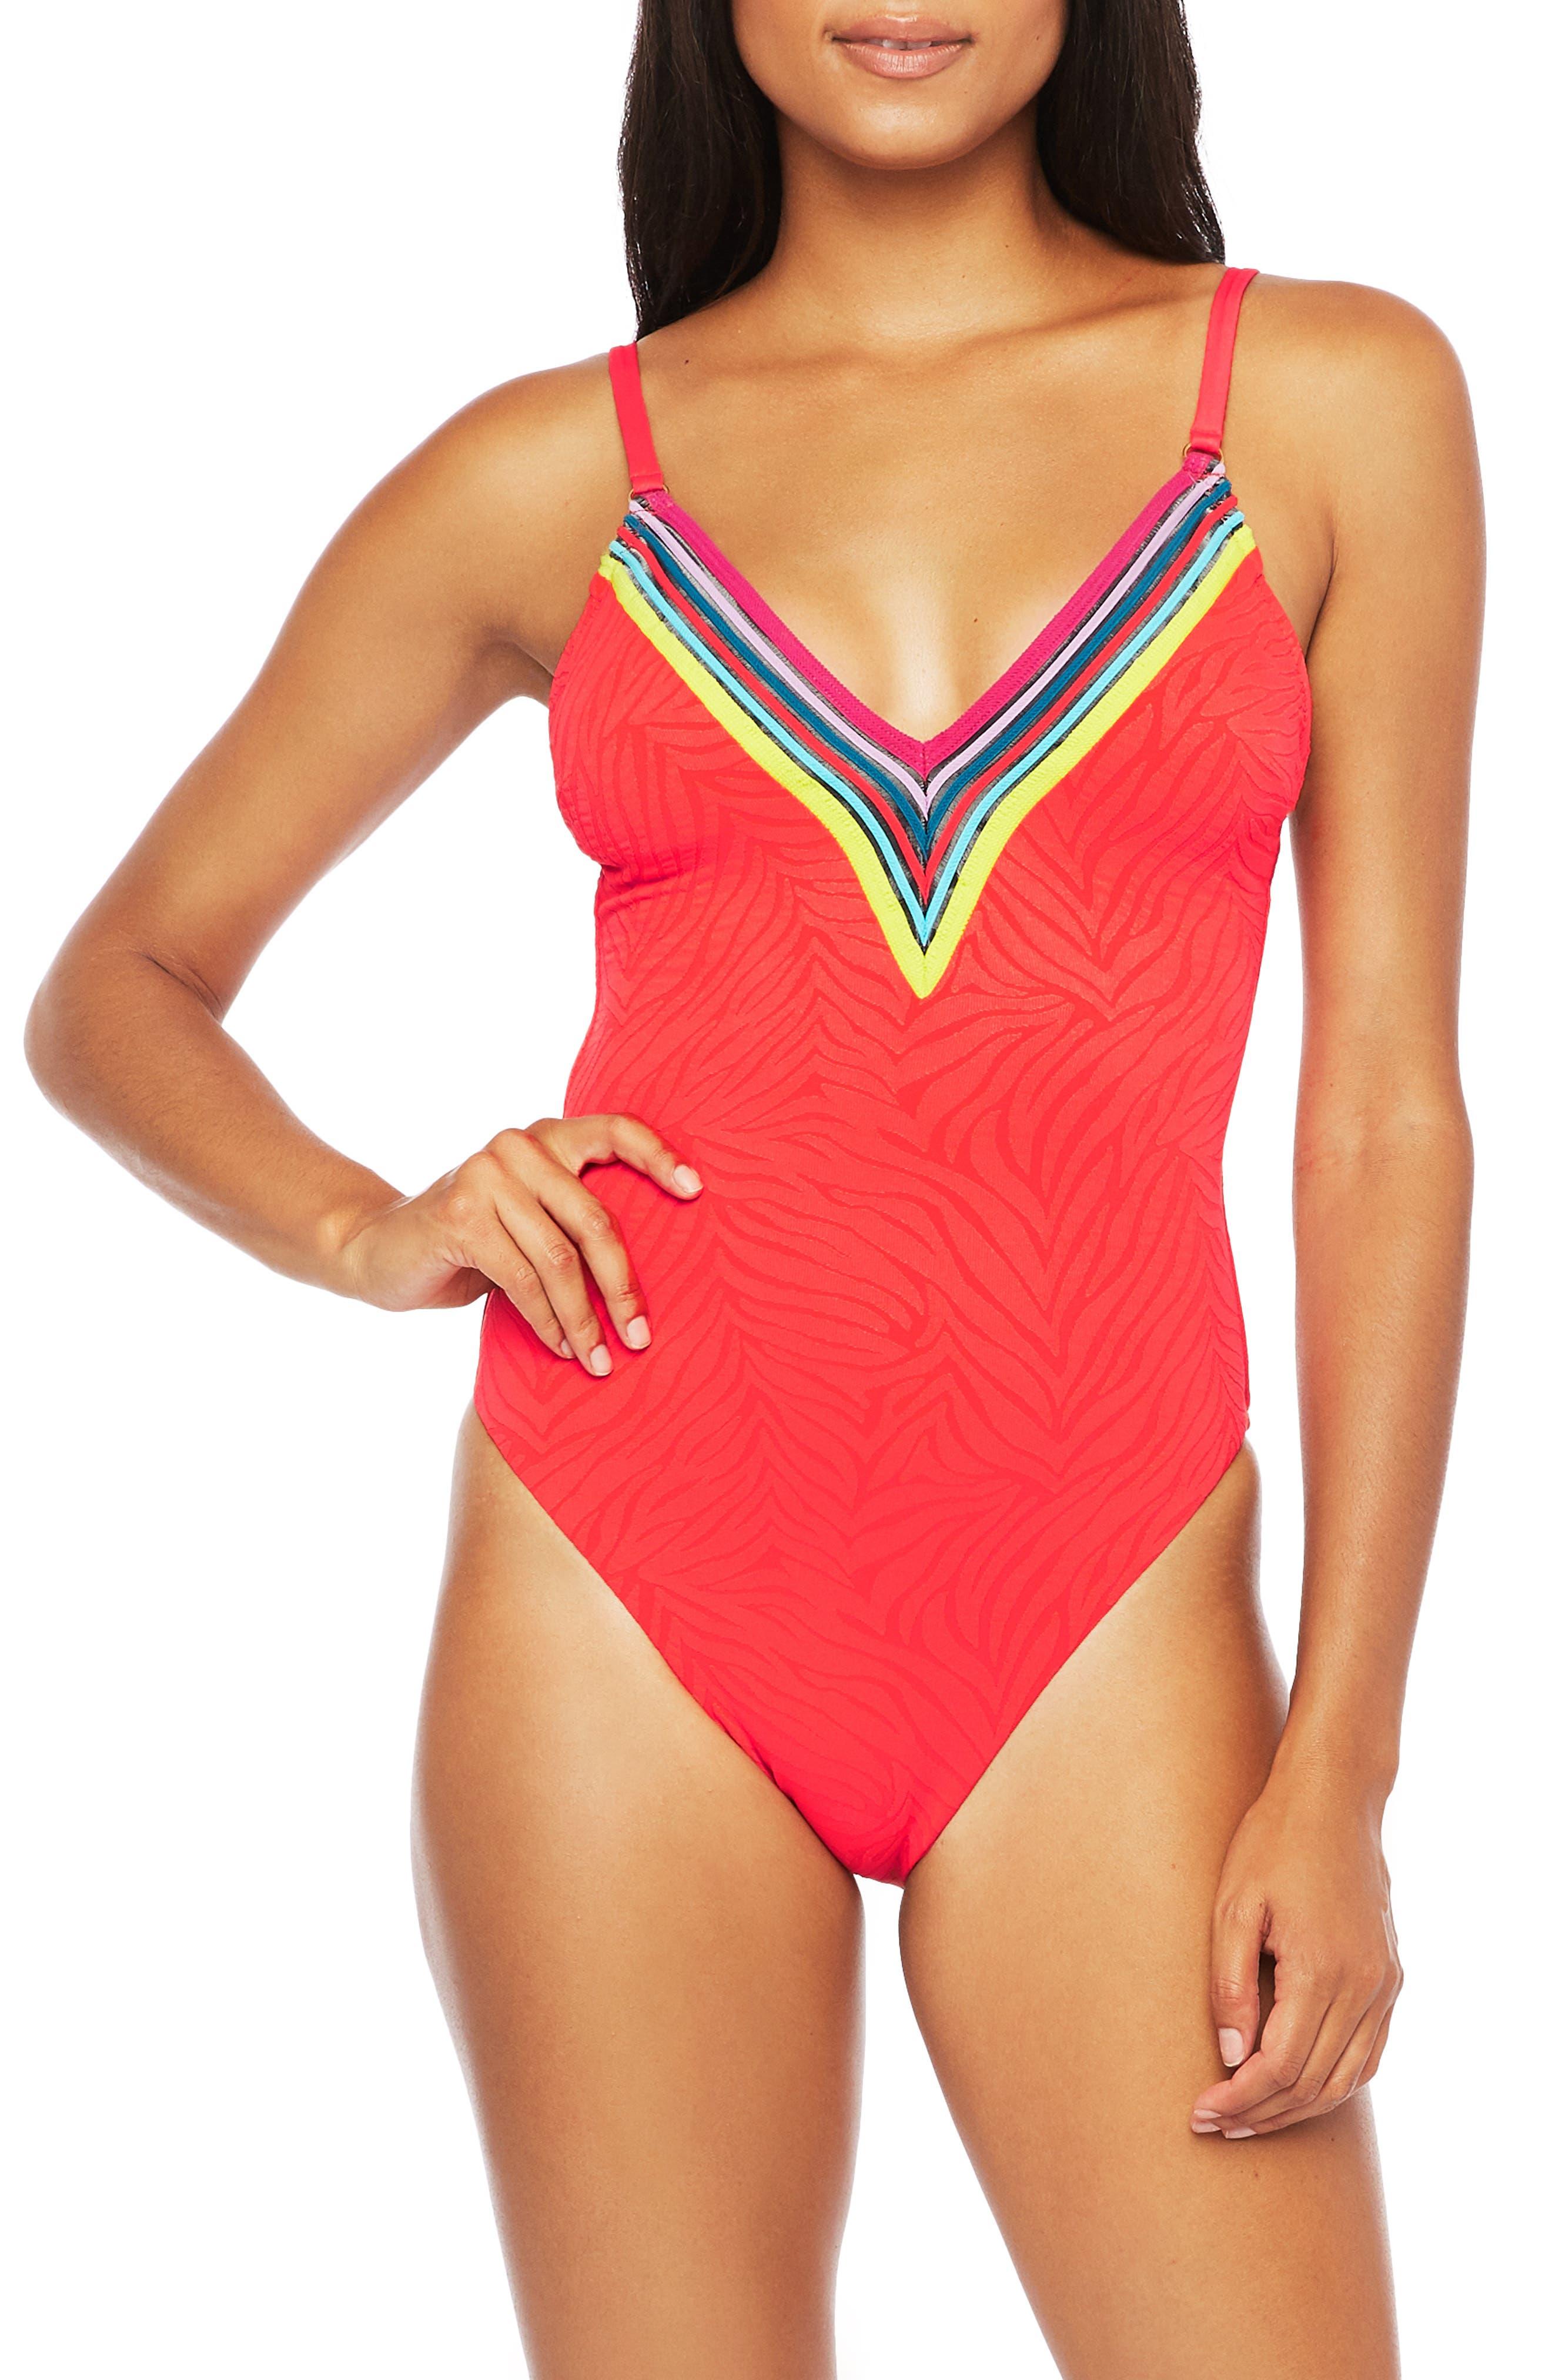 Vintage Bathing Suits | Retro Swimwear | Vintage Swimsuits Womens Trina Turk Stripe Trim Zebra One-Piece Swimsuit Size 8 - Red $97.20 AT vintagedancer.com